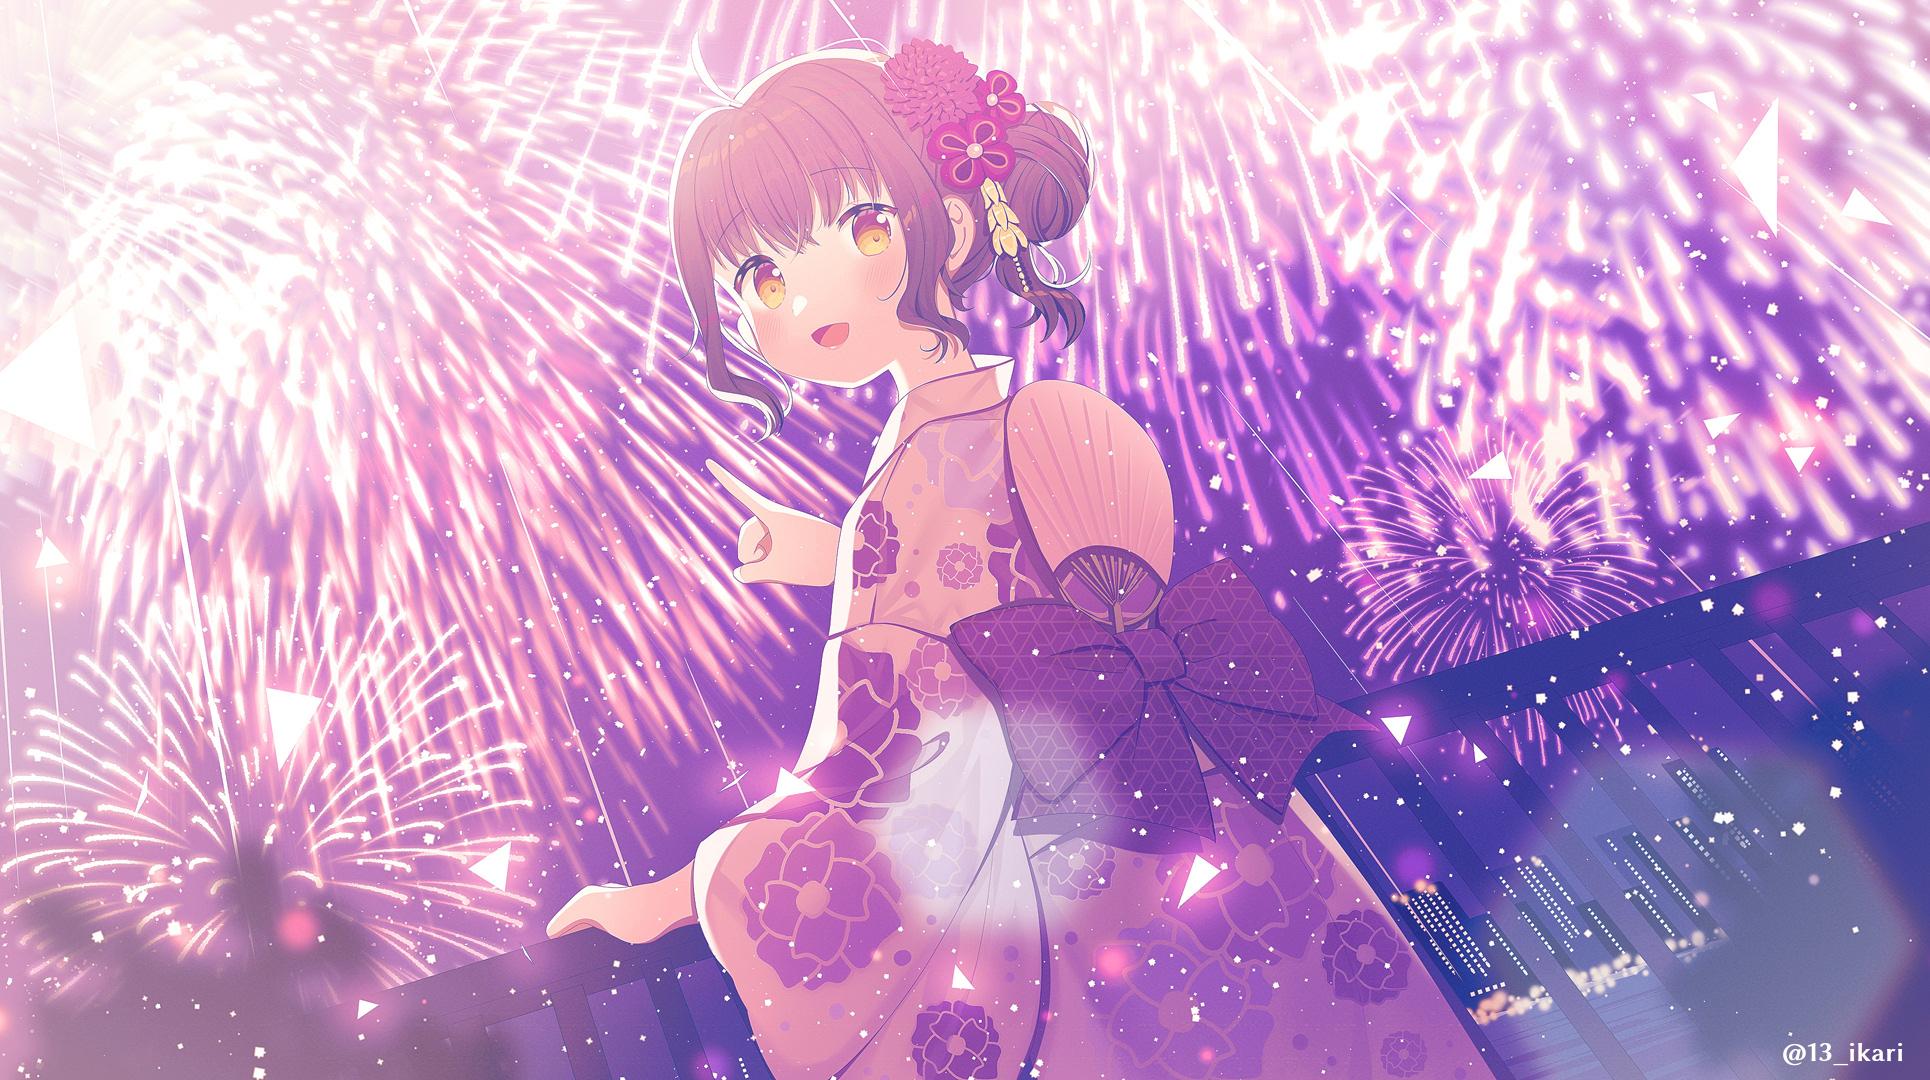 Anime Anime Girls Ikari Artwork Fireworks Japanese Clothes 1930x1080